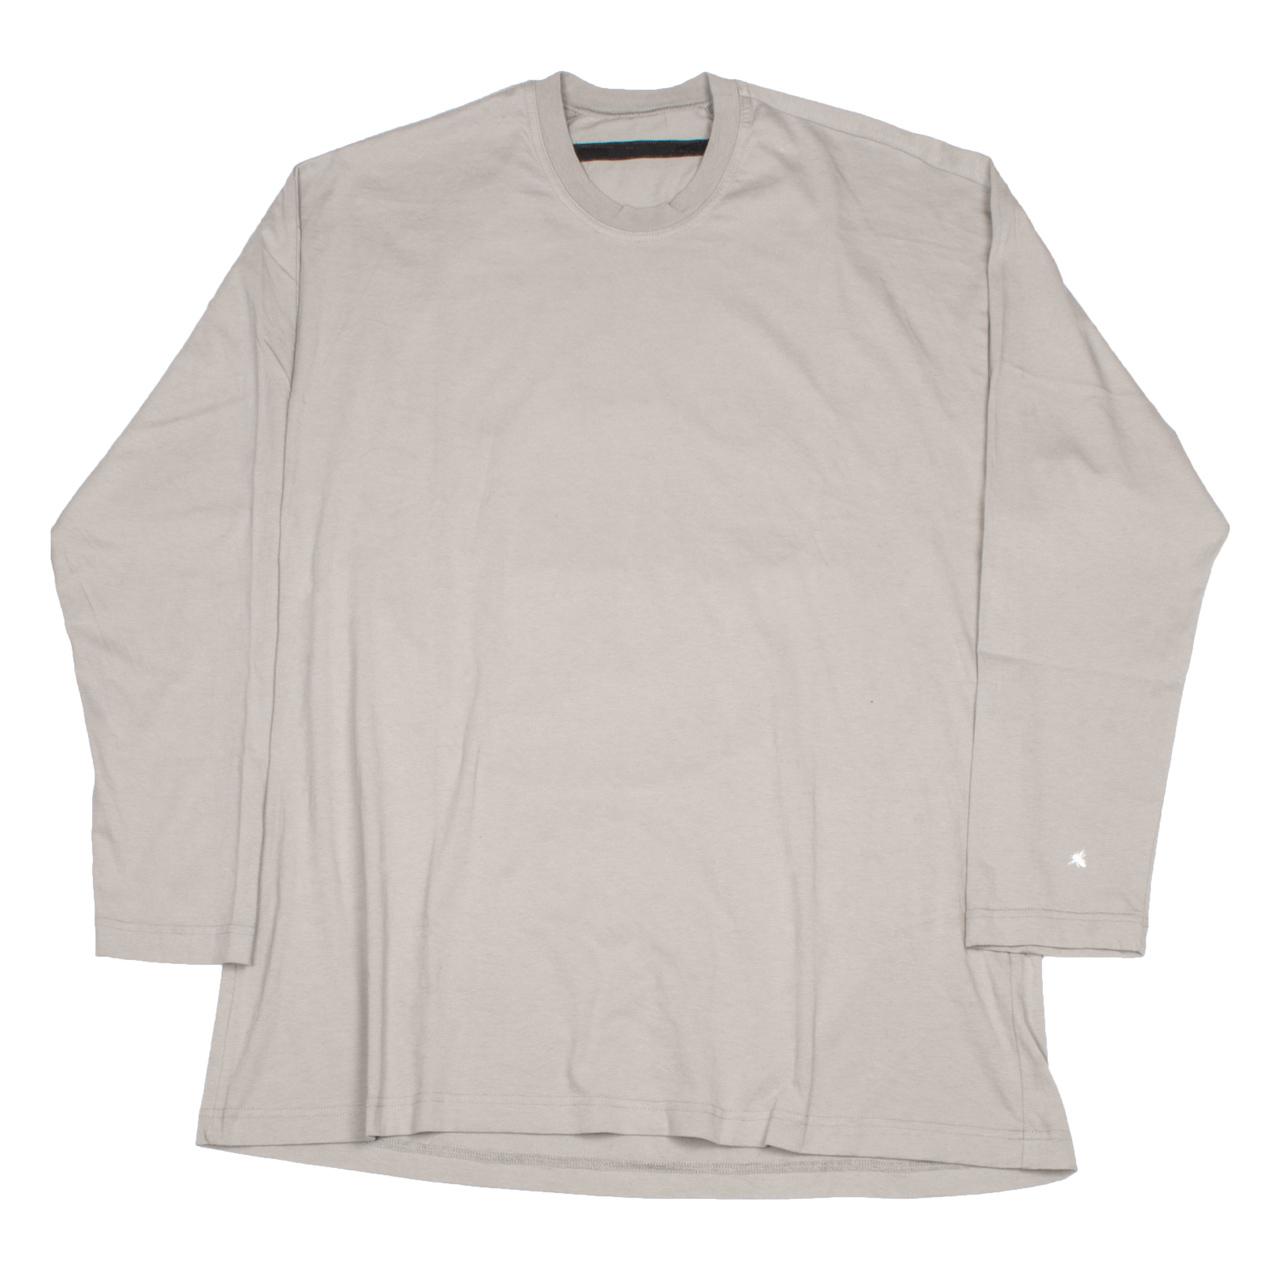 720CPM7-BEIGE / バックプリント ロングスリーブ Tシャツ